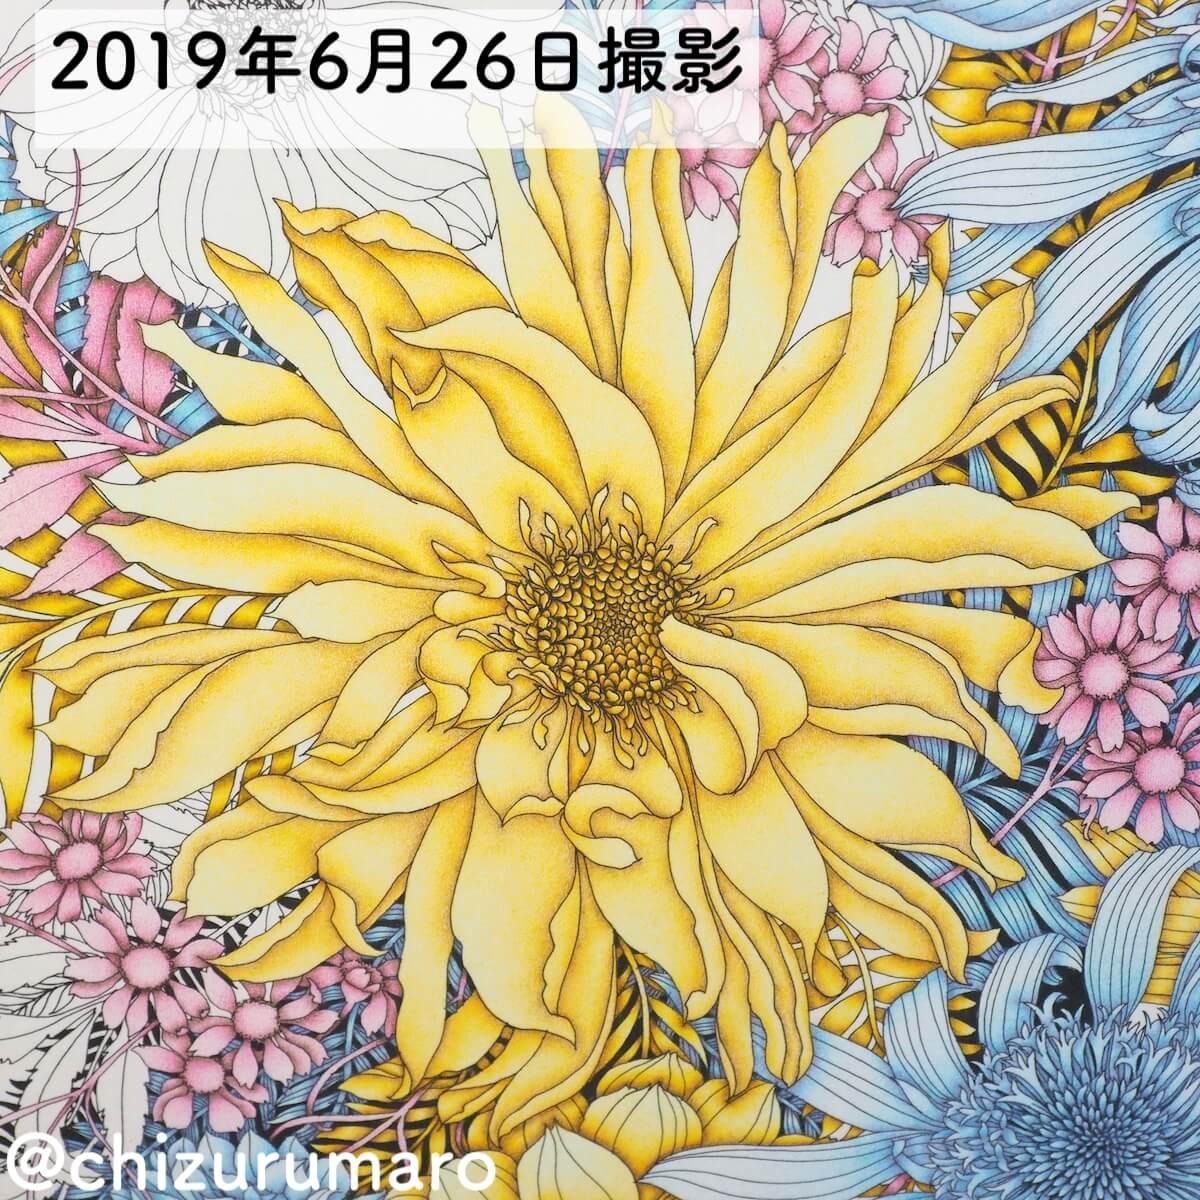 f:id:chizurumaro:20190626102019j:plain